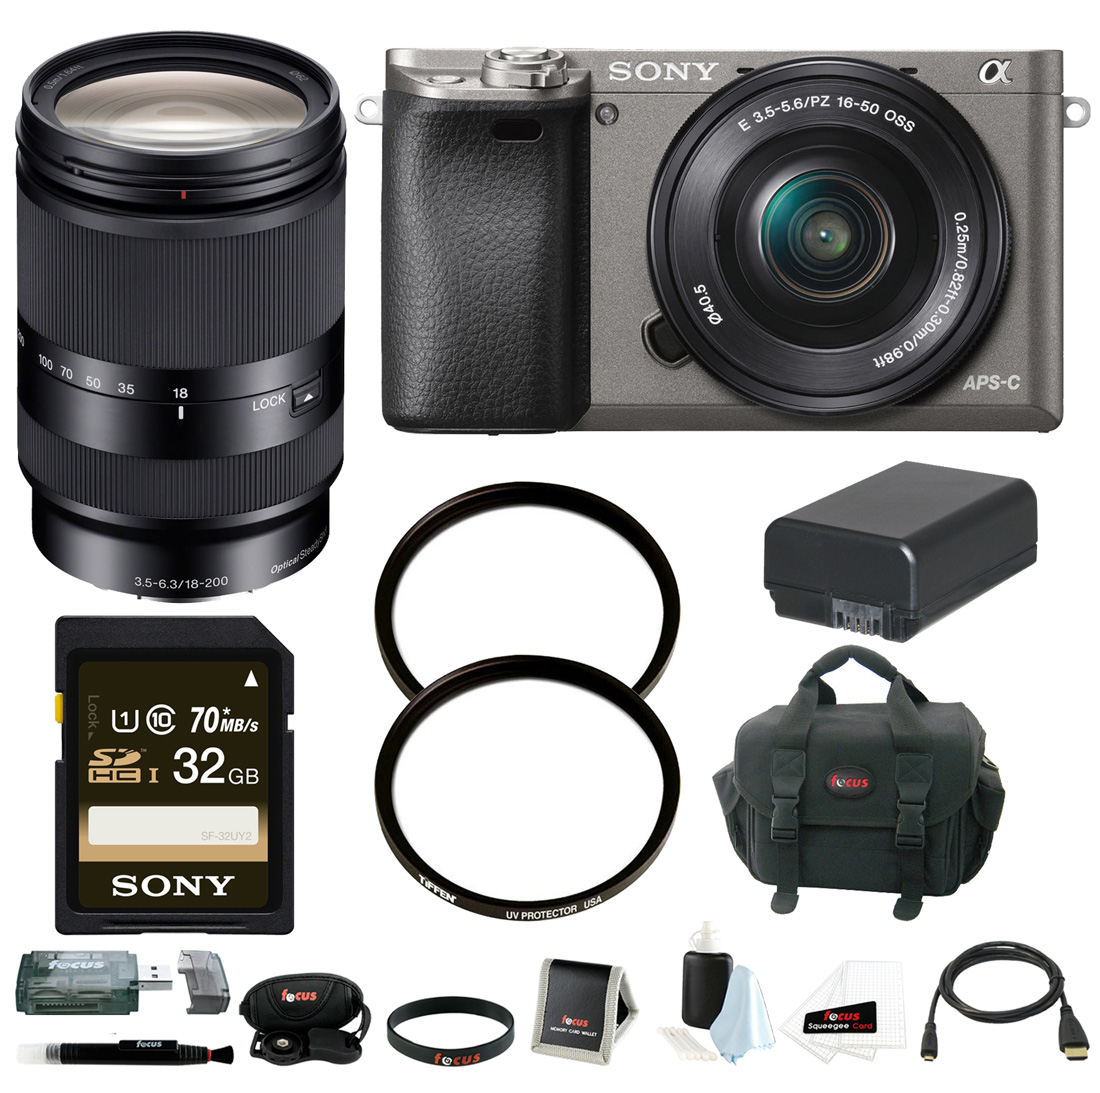 Sony Alpha A6000 Camera w/ 16-50mm & 18-200mm Lens Accessory Bundle - Graphite